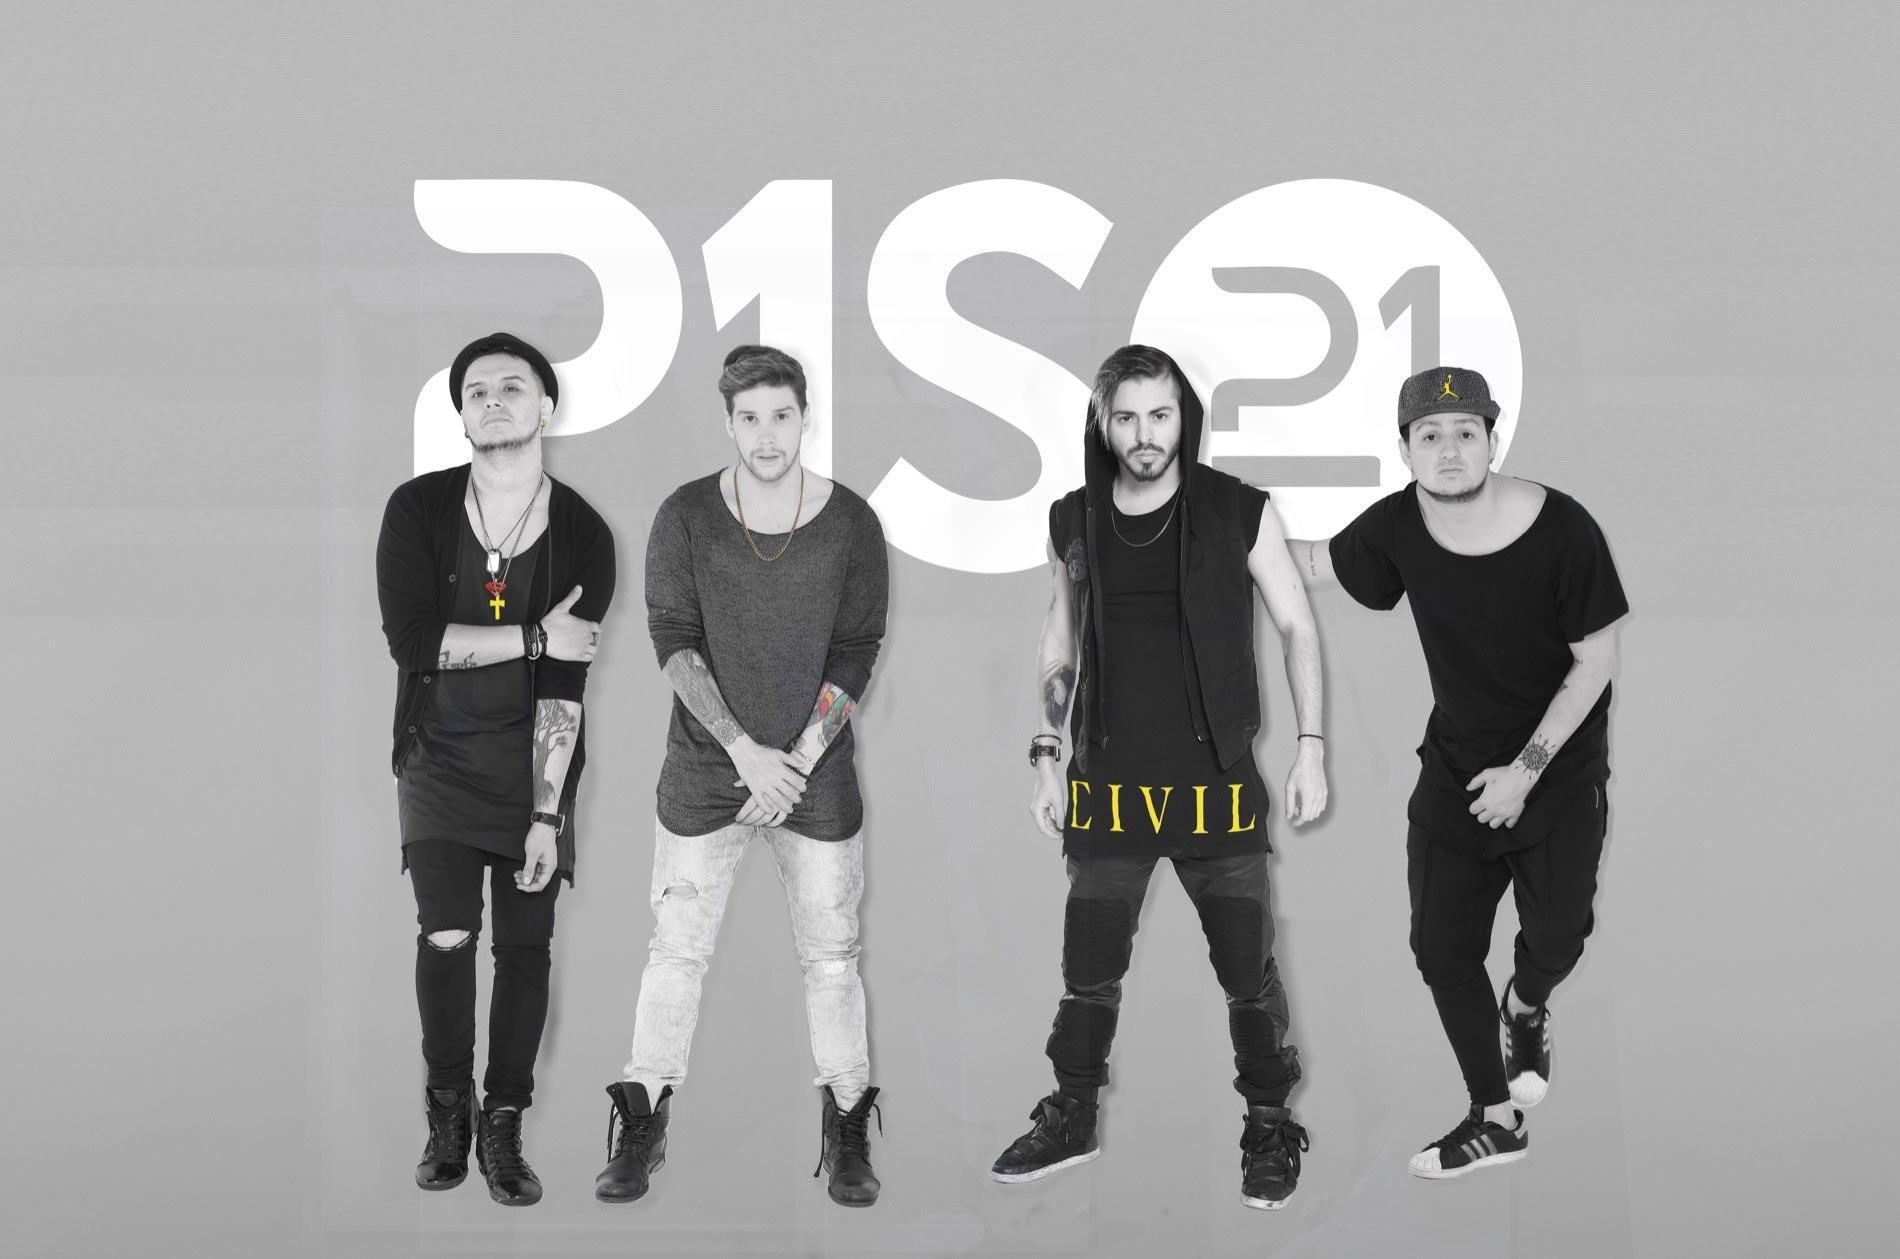 Piso 21 lyrics music news and biography metrolyrics for Piso 21 me llamas letra